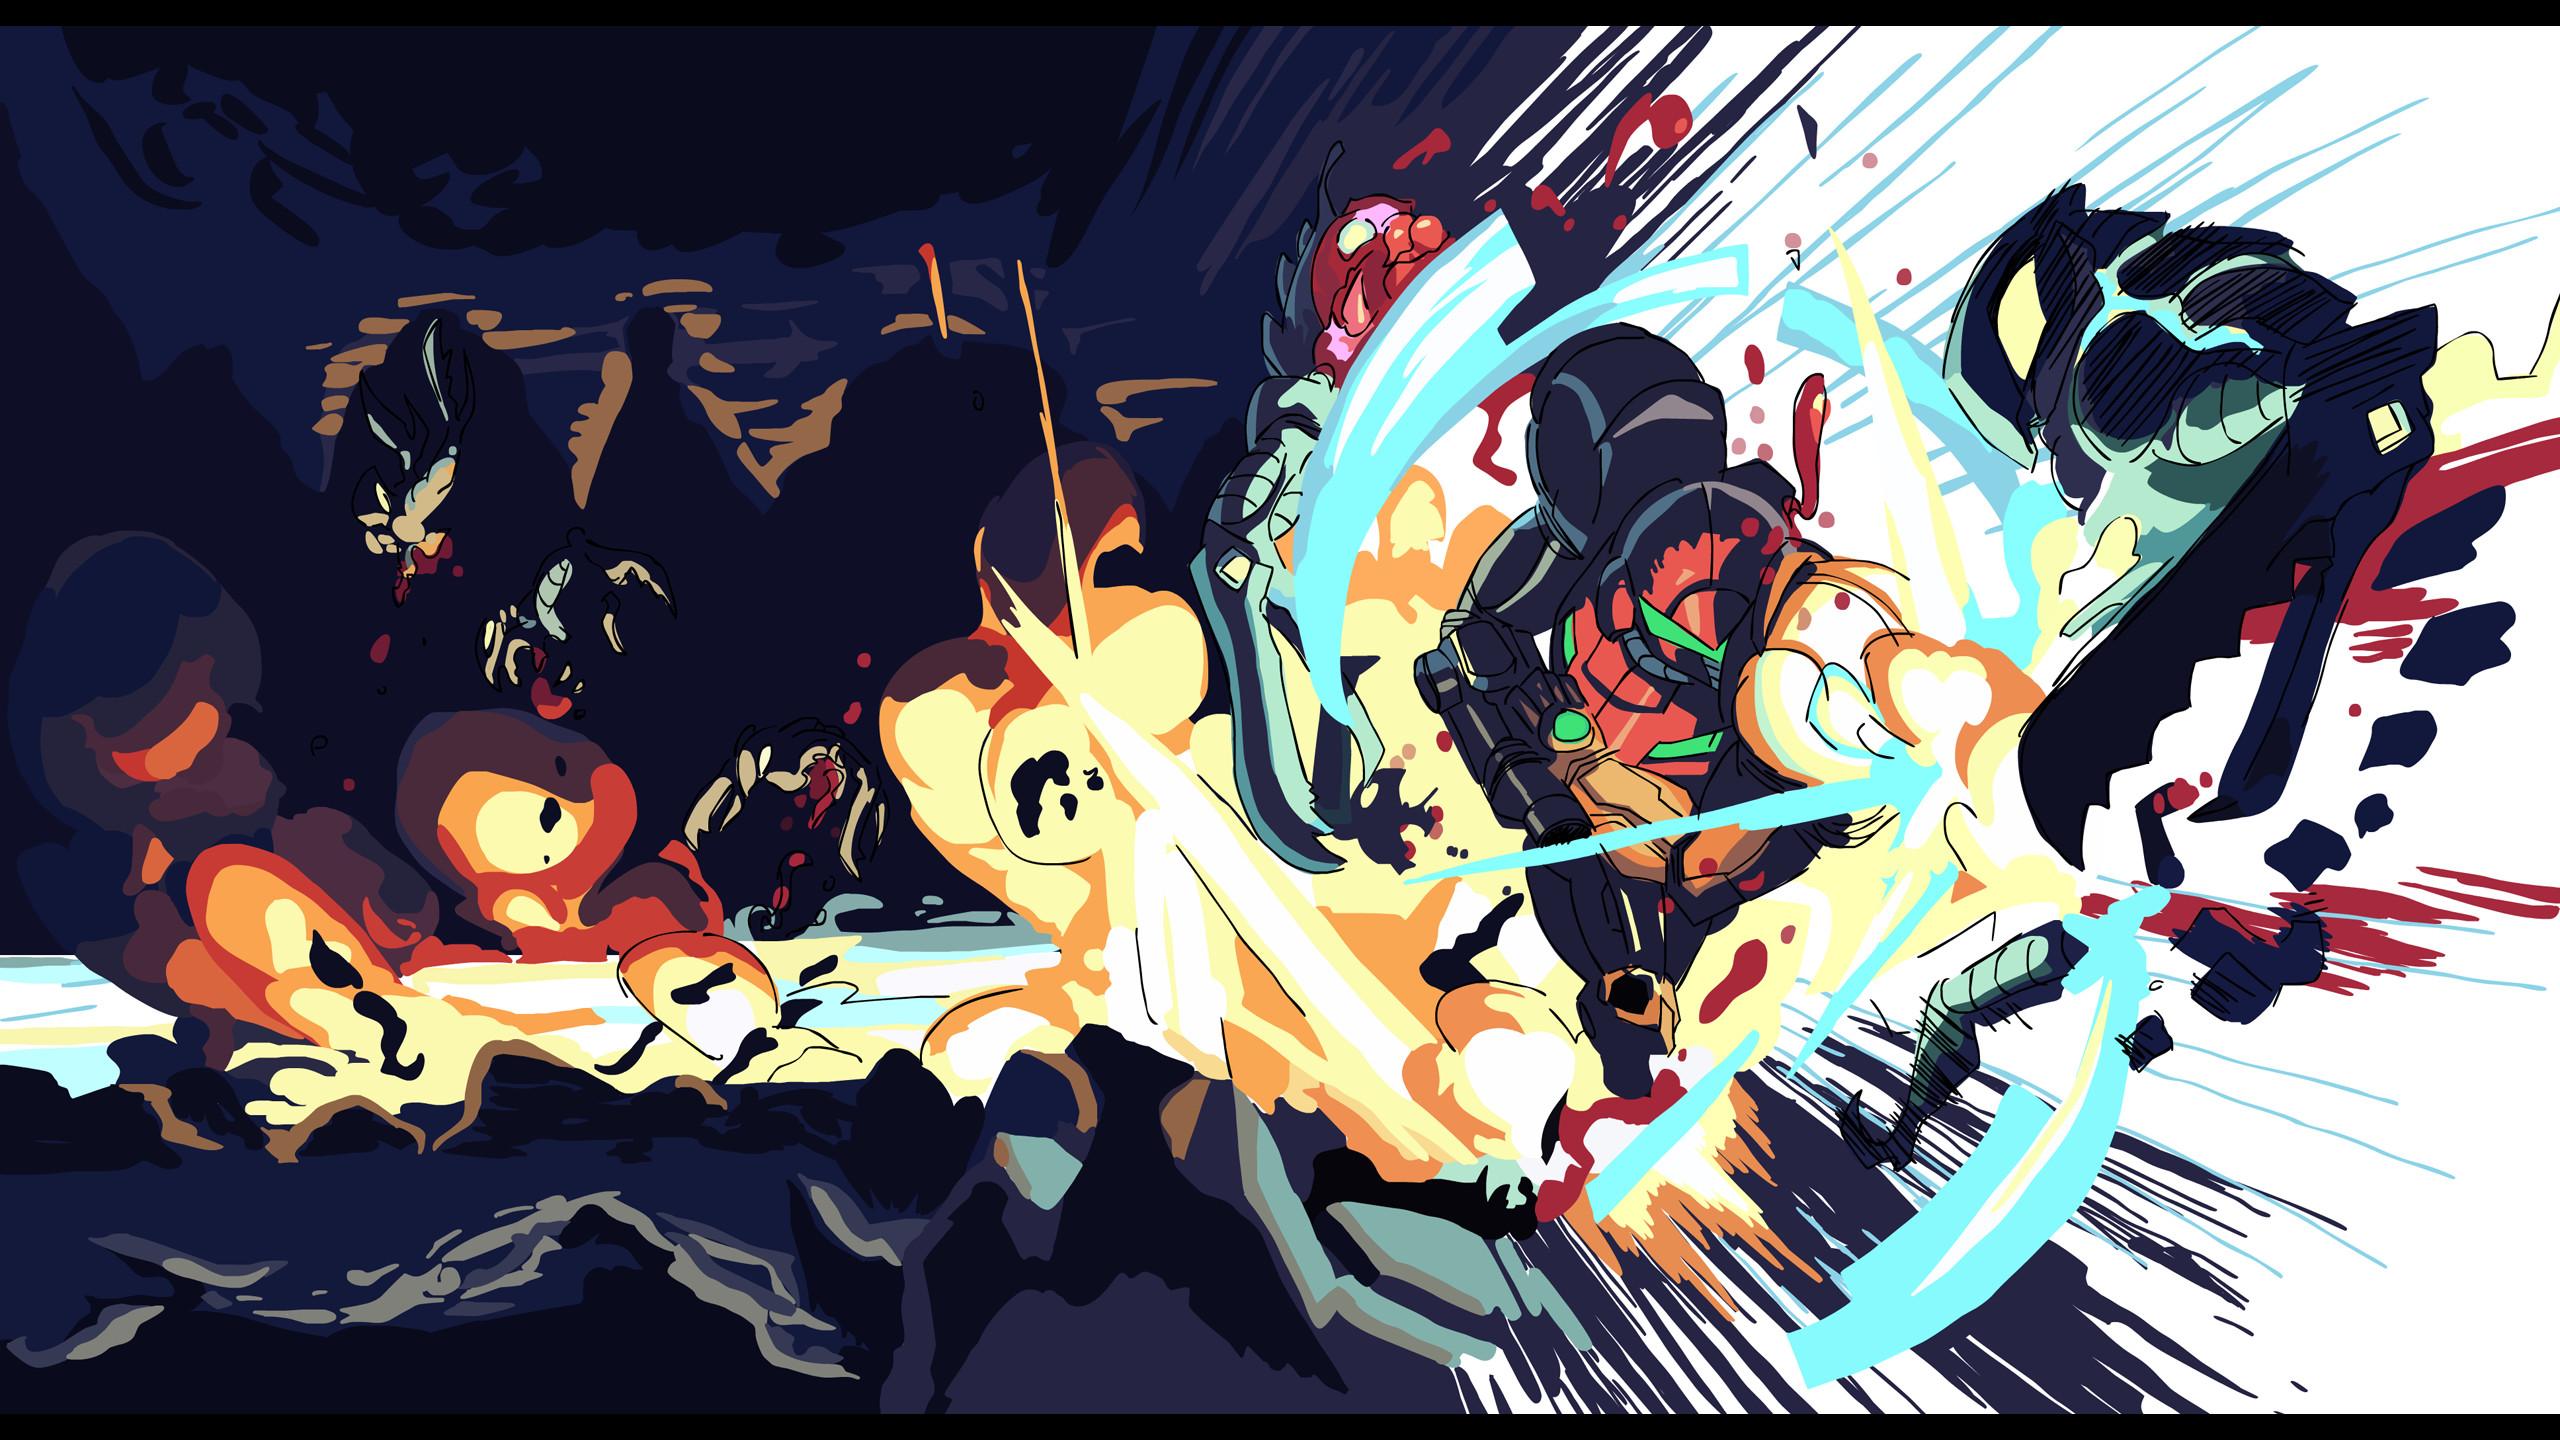 day of the dead samus – Google Search | Metroid: She's All Chrome 83 |  Pinterest | Metroid, Samus aran and Videogames